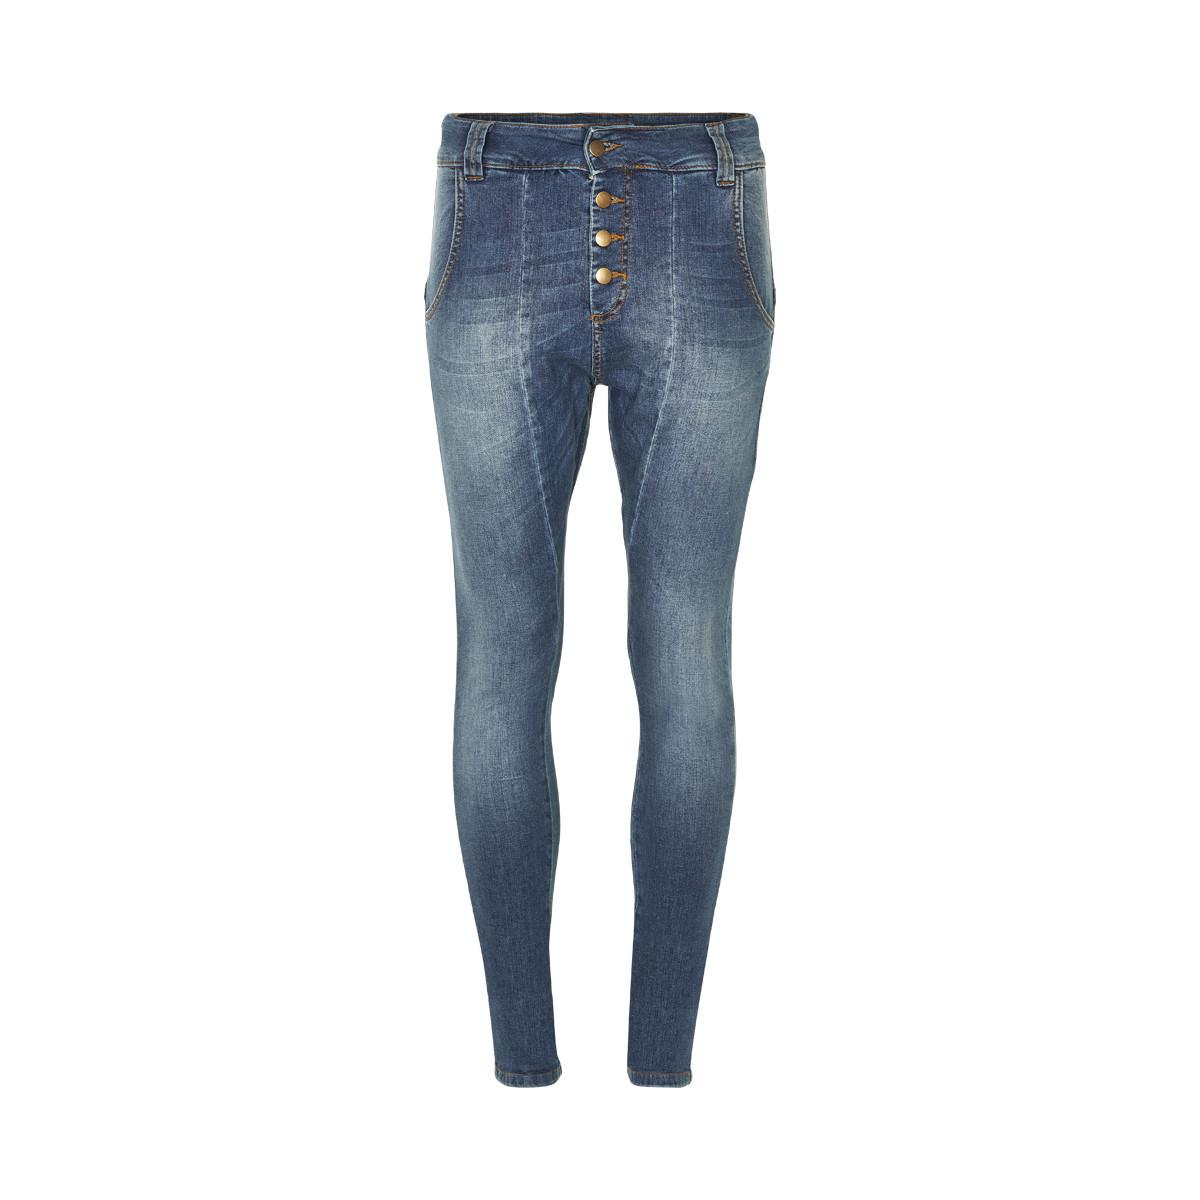 henriette steffensen copenhagen 2097 baggy jeans. Black Bedroom Furniture Sets. Home Design Ideas